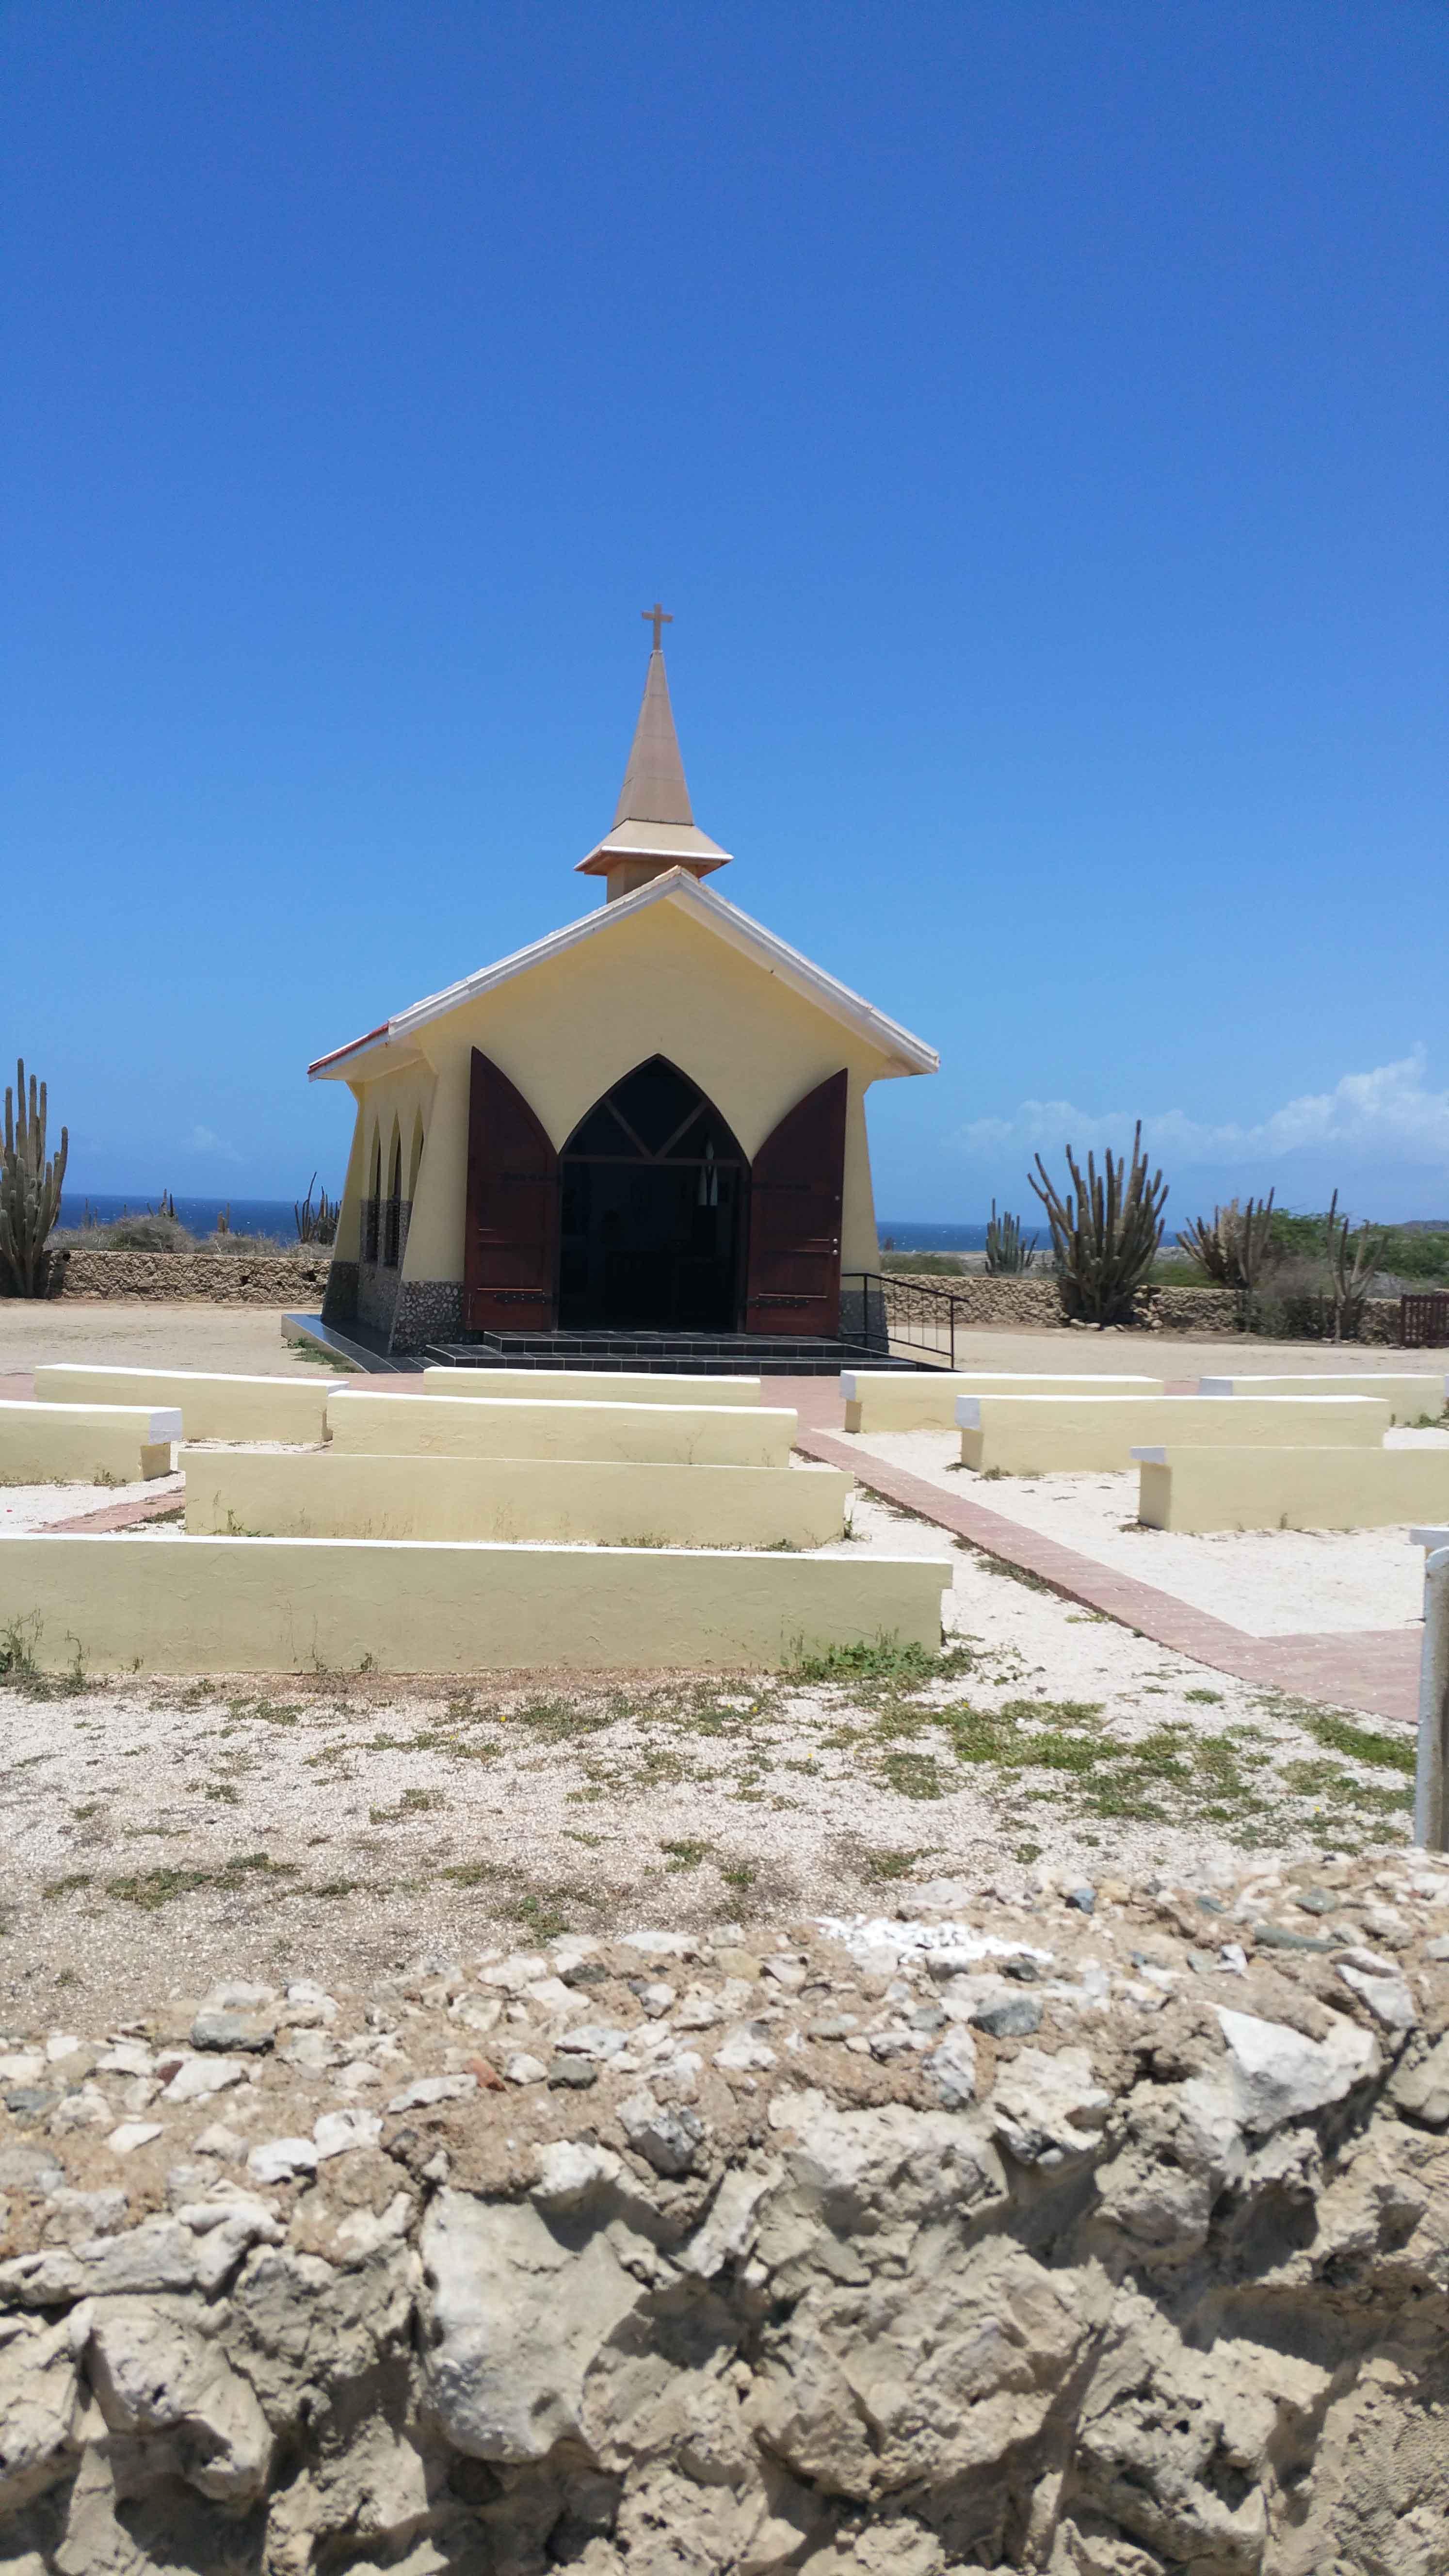 Vakantiewoning Aruba AltoVista kapel - OMGEVING